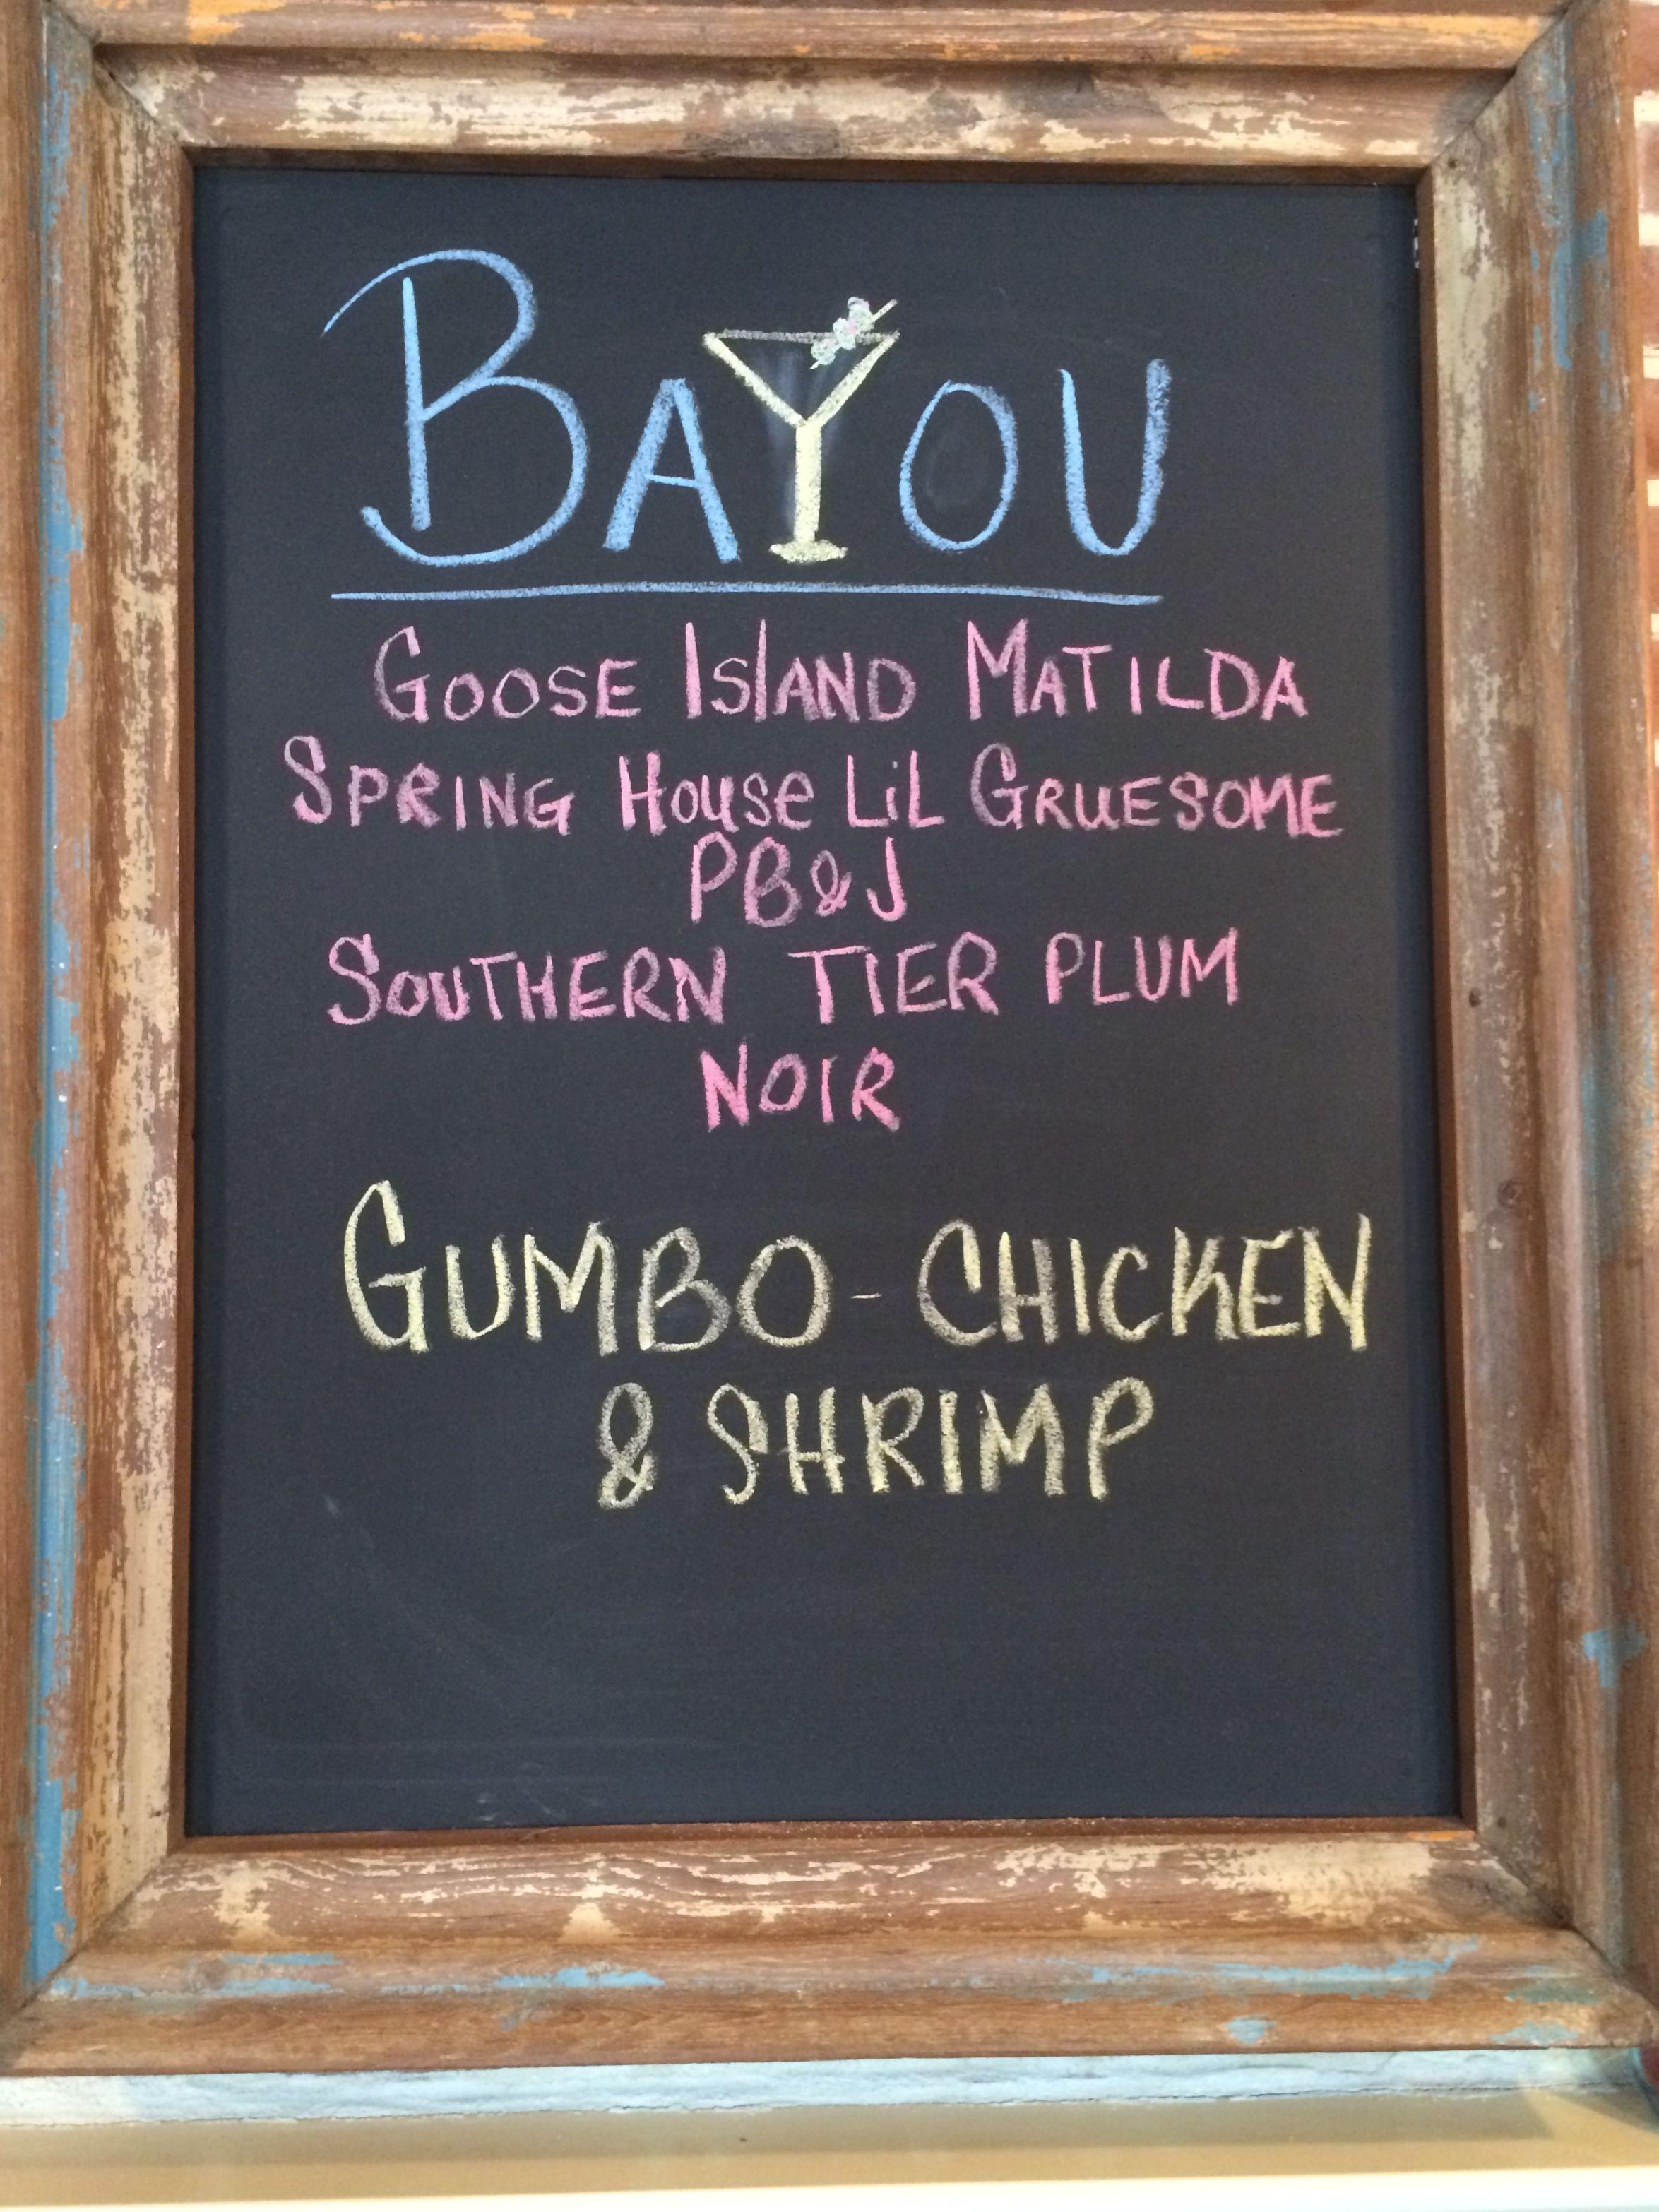 The chalkboard at the Bayou